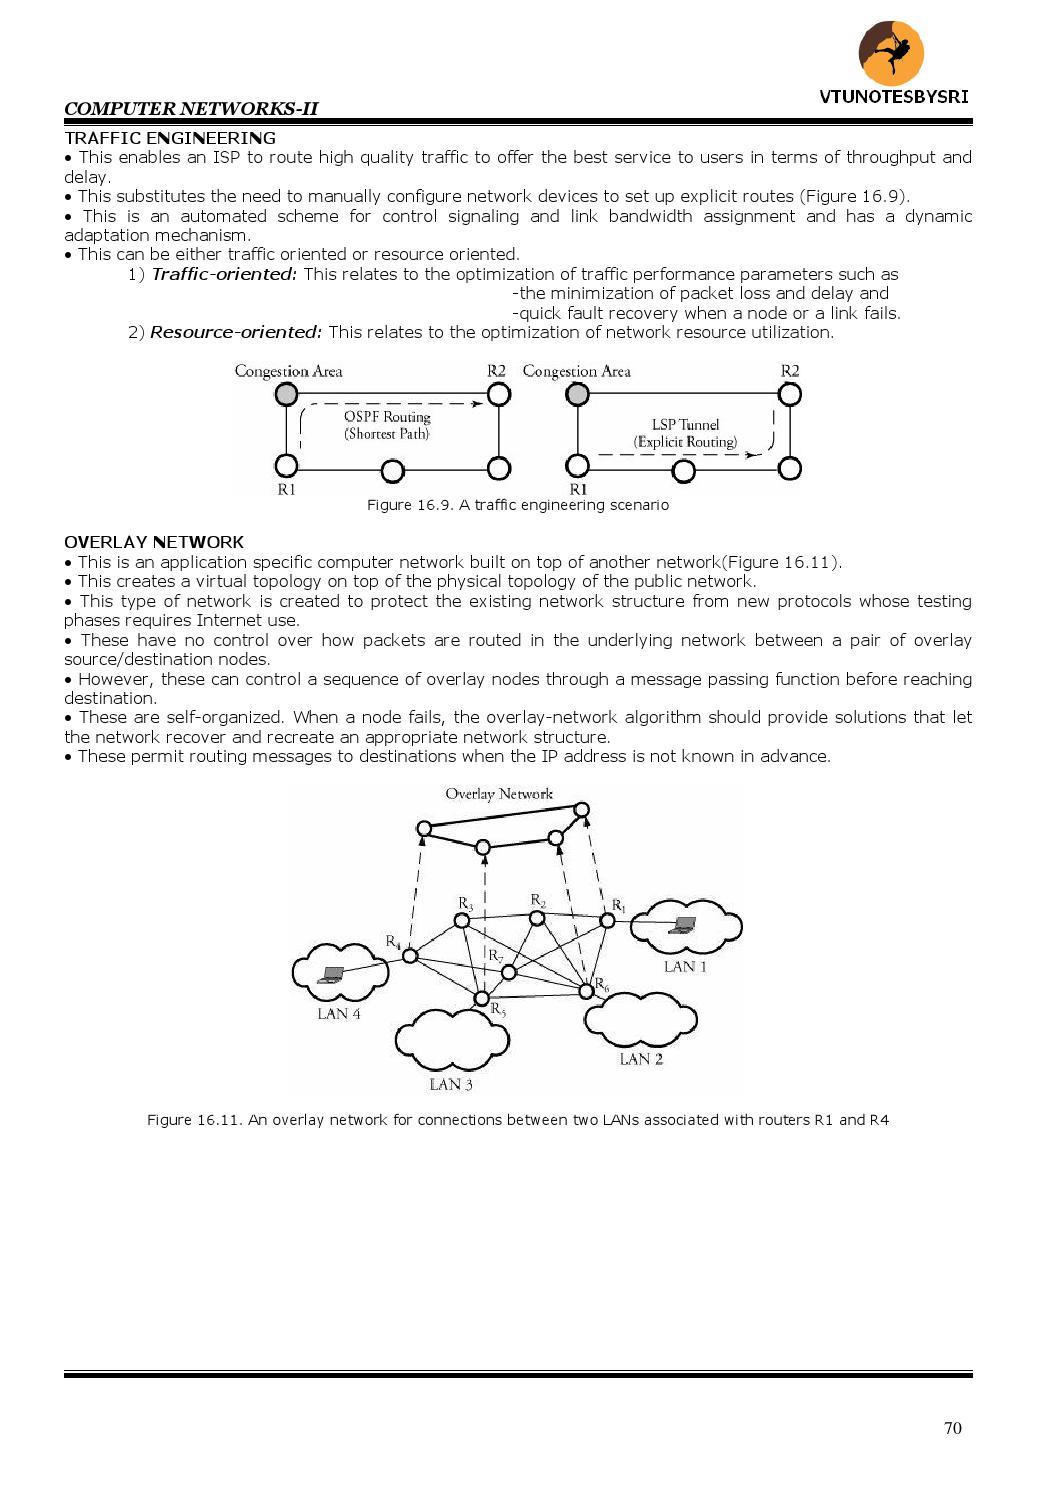 VTU 6TH SEM CSE COMPUTER NETWORKS 2 NOTES 10CS64 by VTUNOTESBYSREE